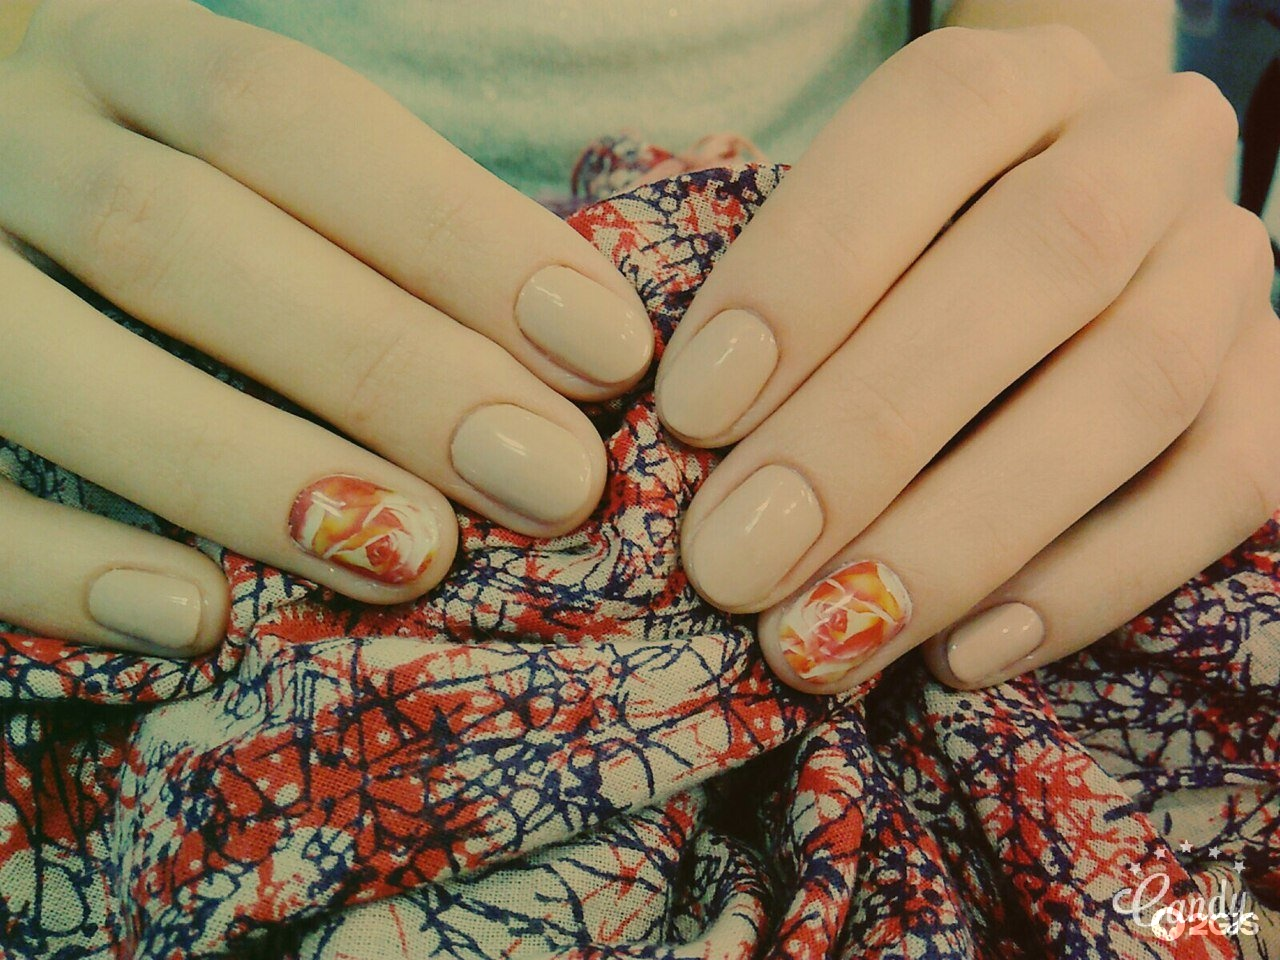 Наращивание ногтей в одессе фото